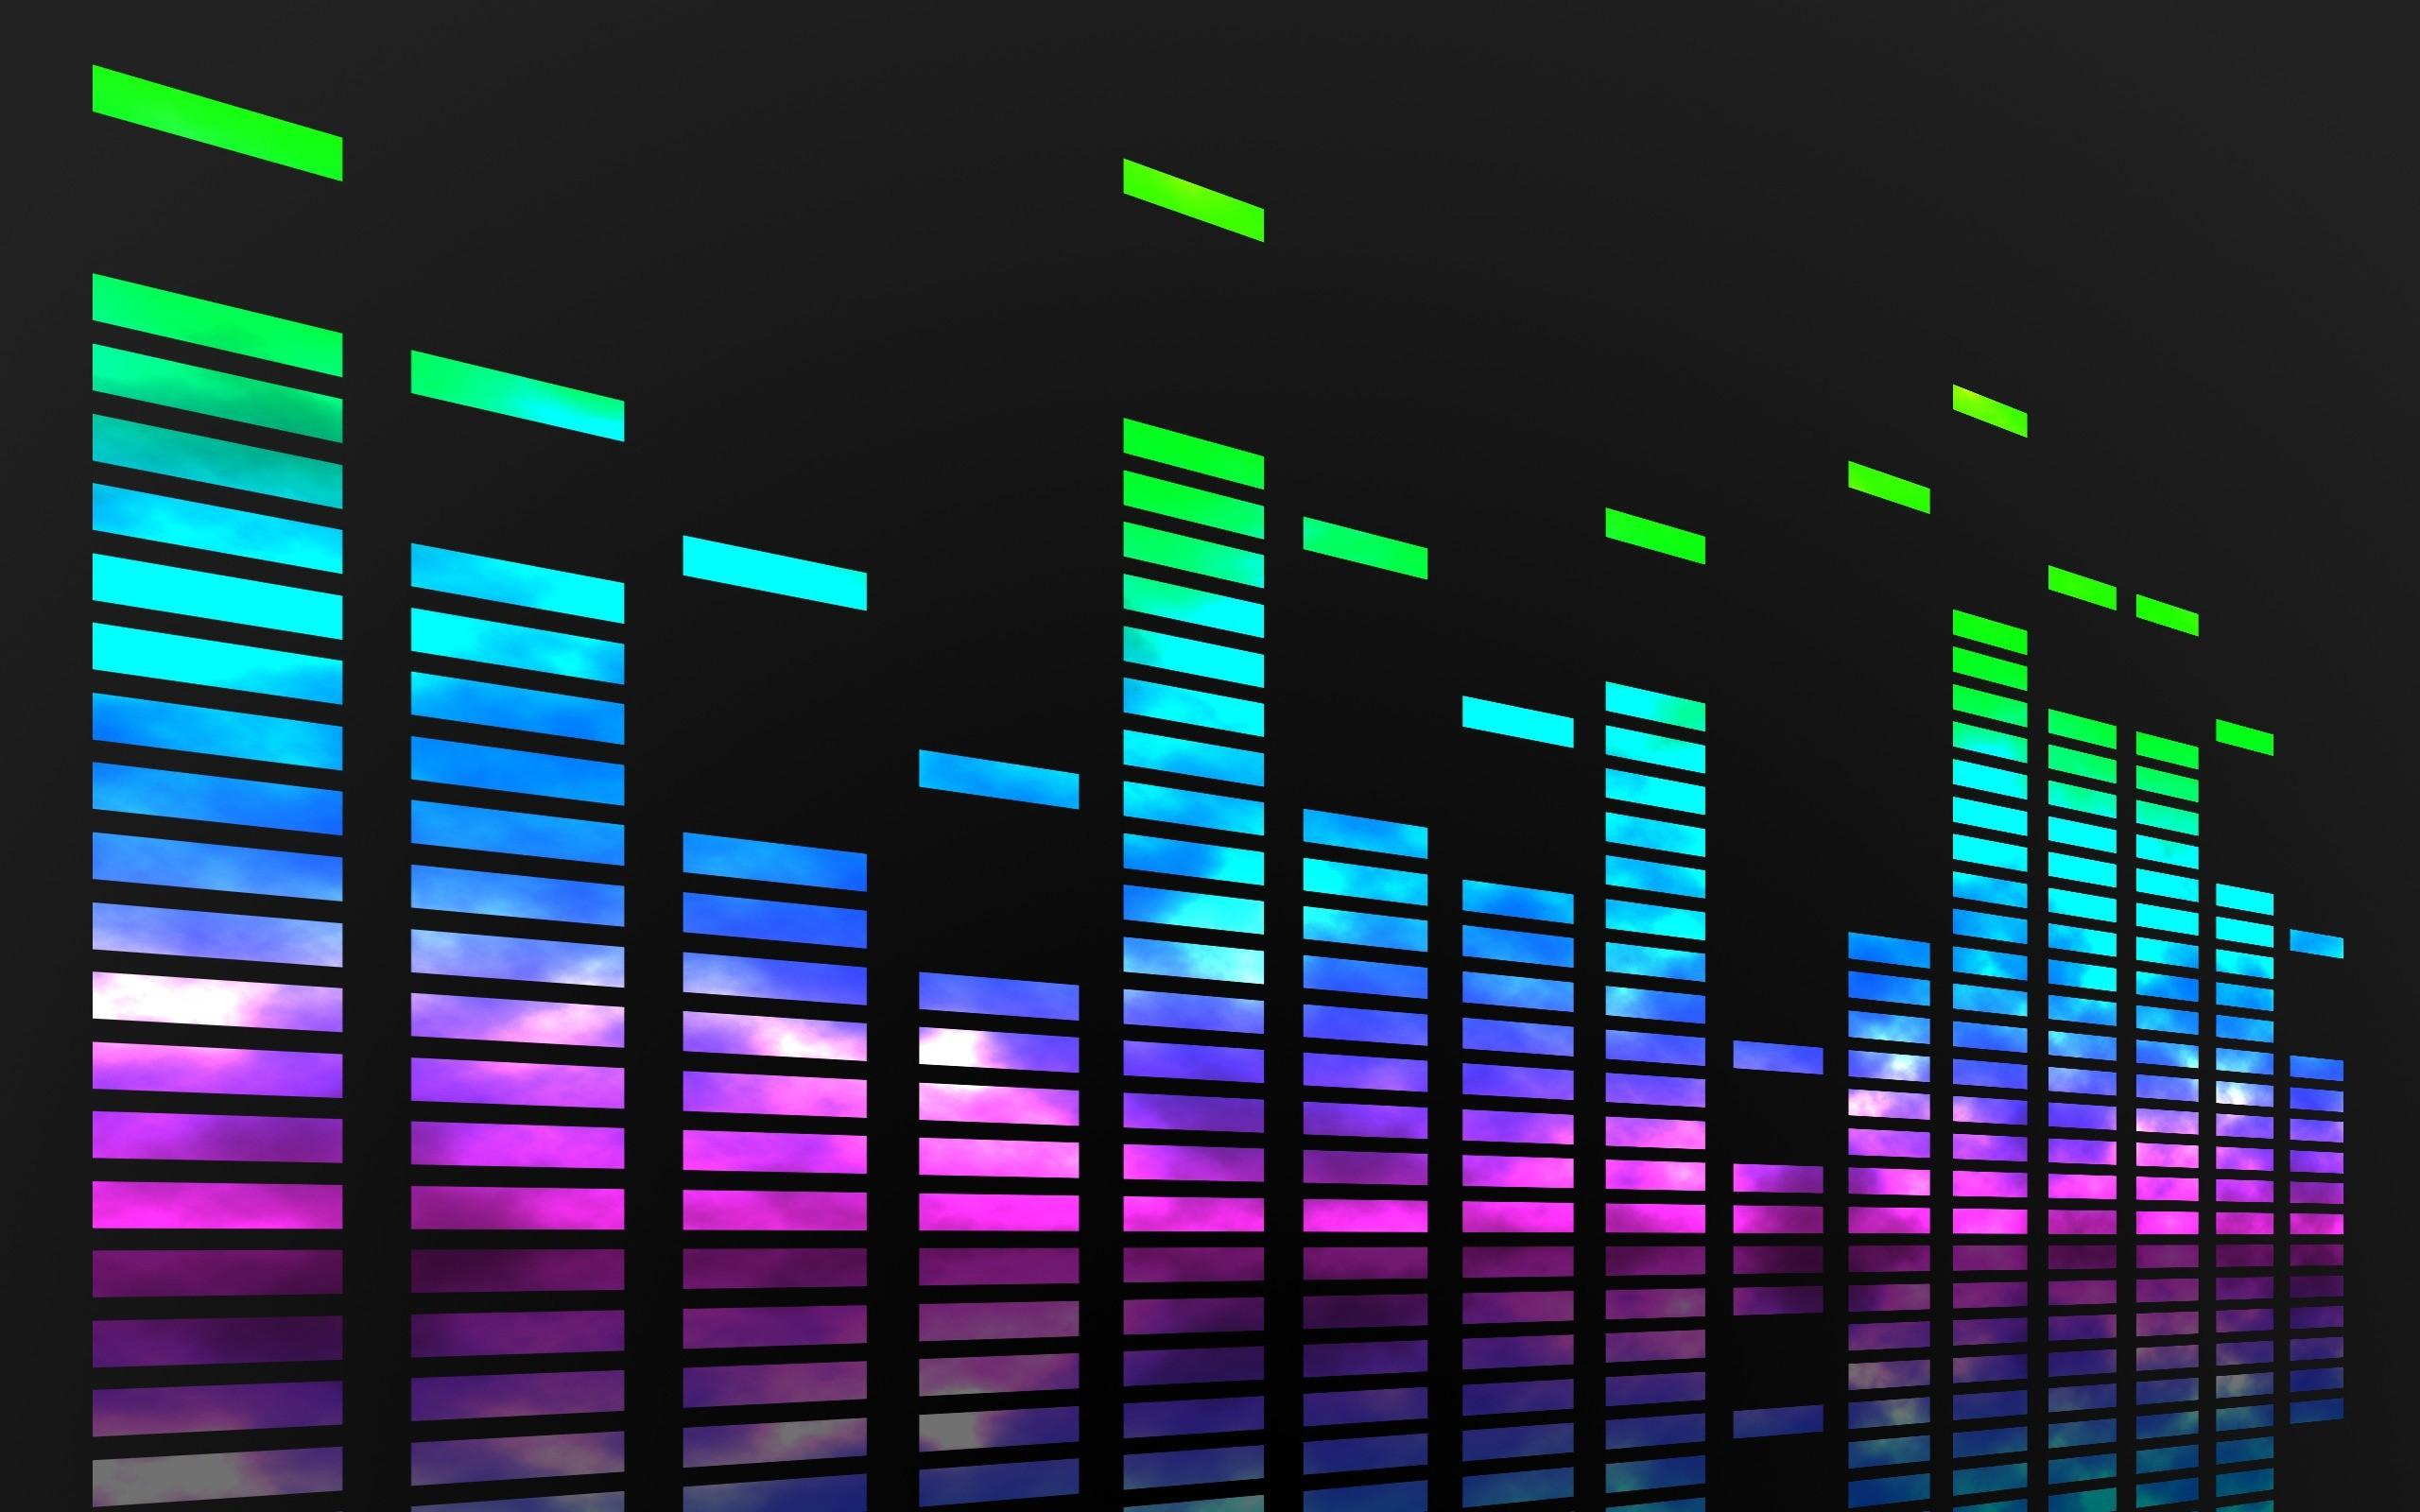 DJ Music Wallpapers HD Cool HD Music Wallpaper Desktop Equaliser Dj  Backgrounds